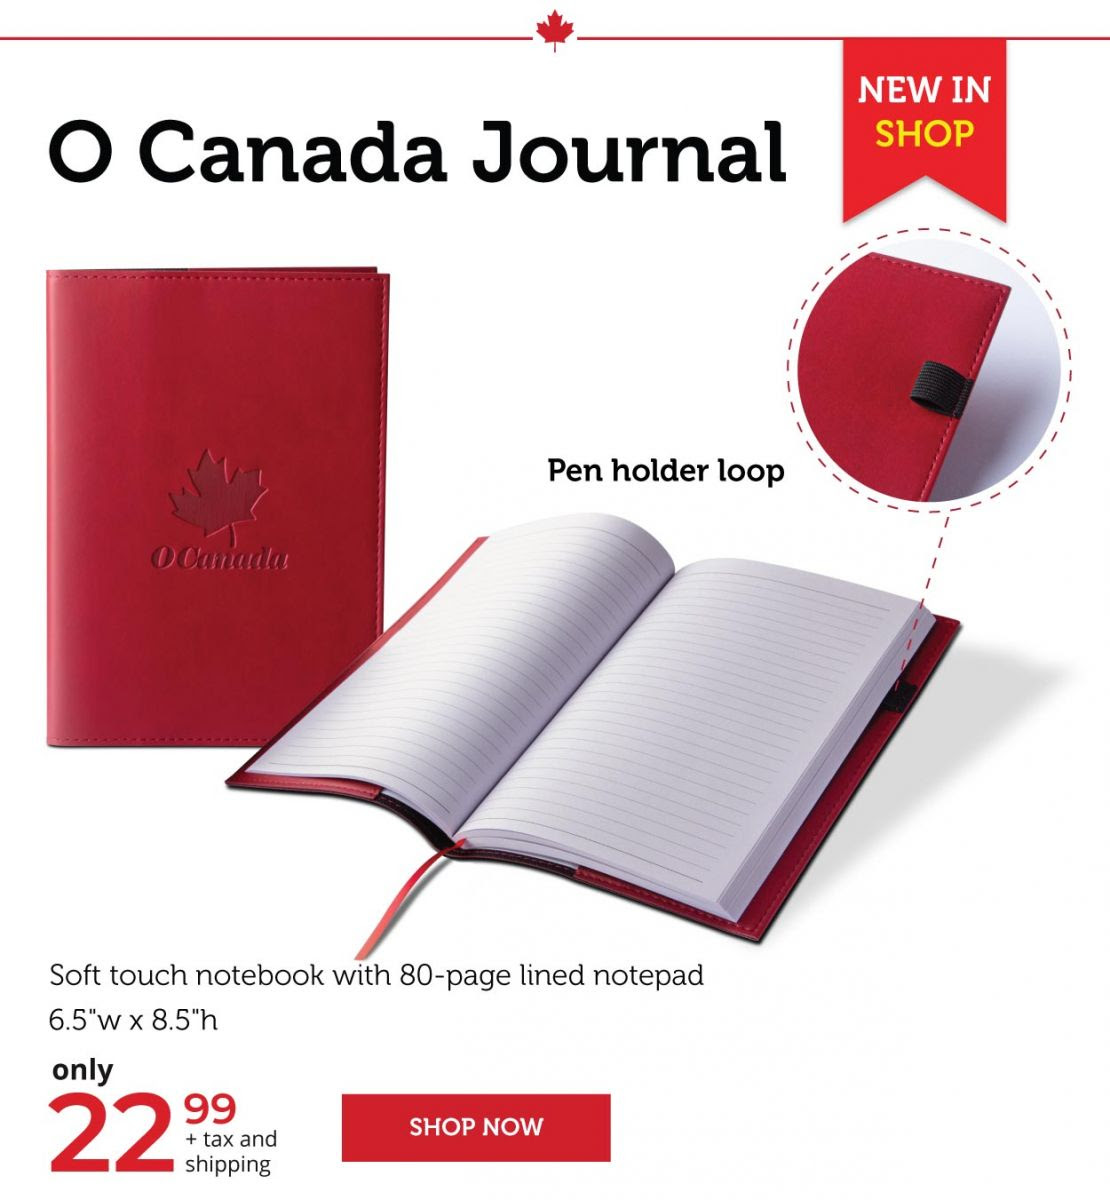 O Canada Journal